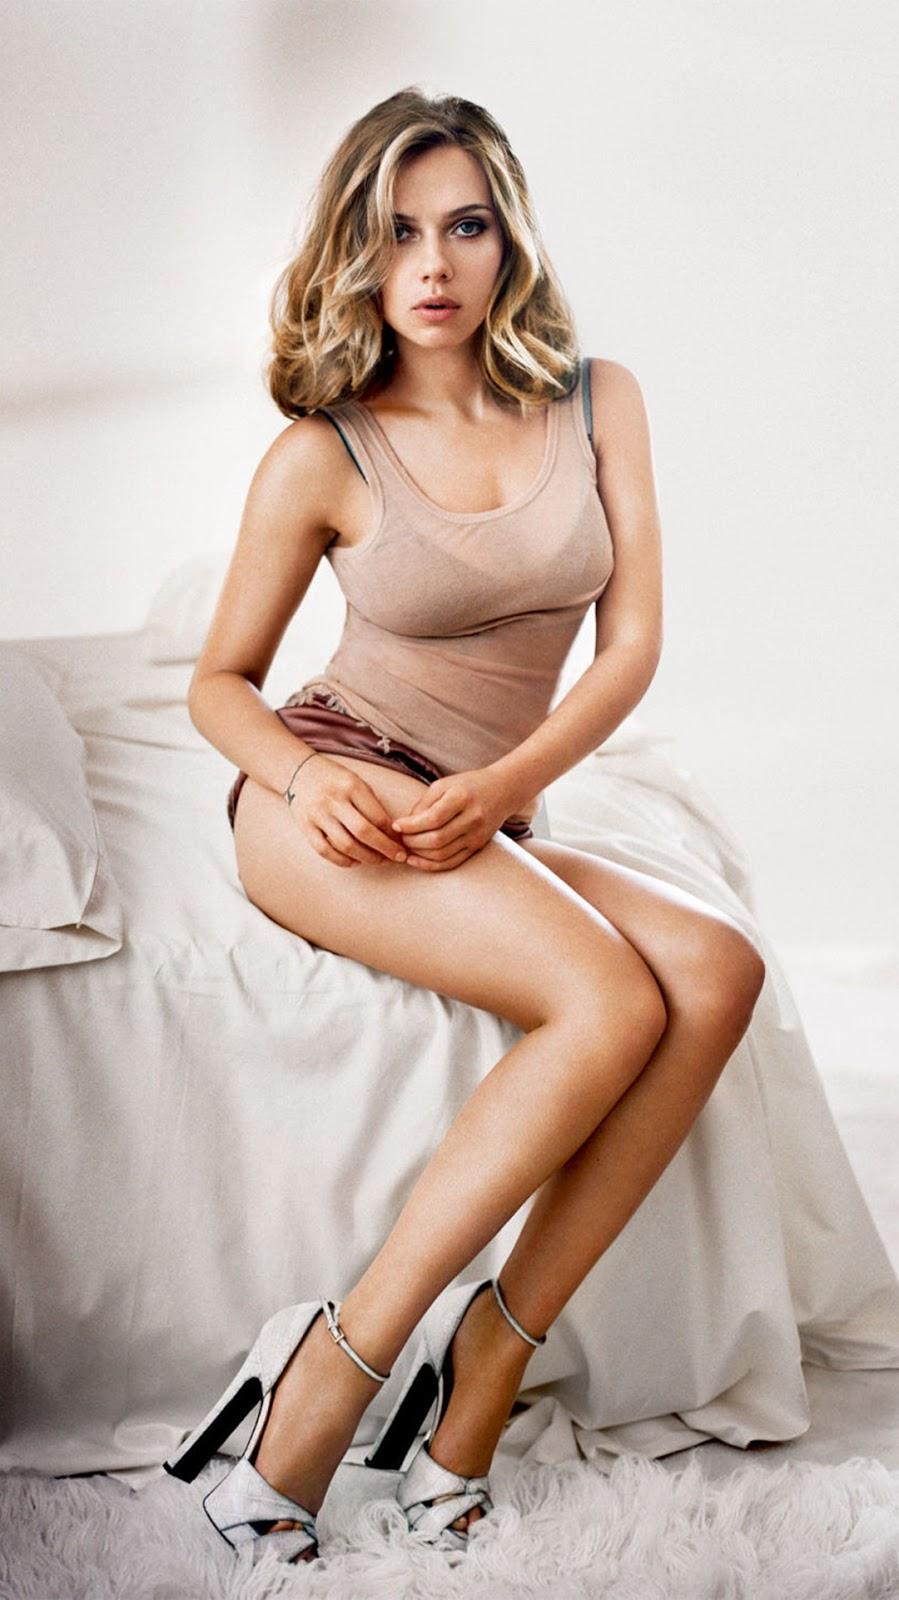 scarlett johansson poster seksi dengan tanktop